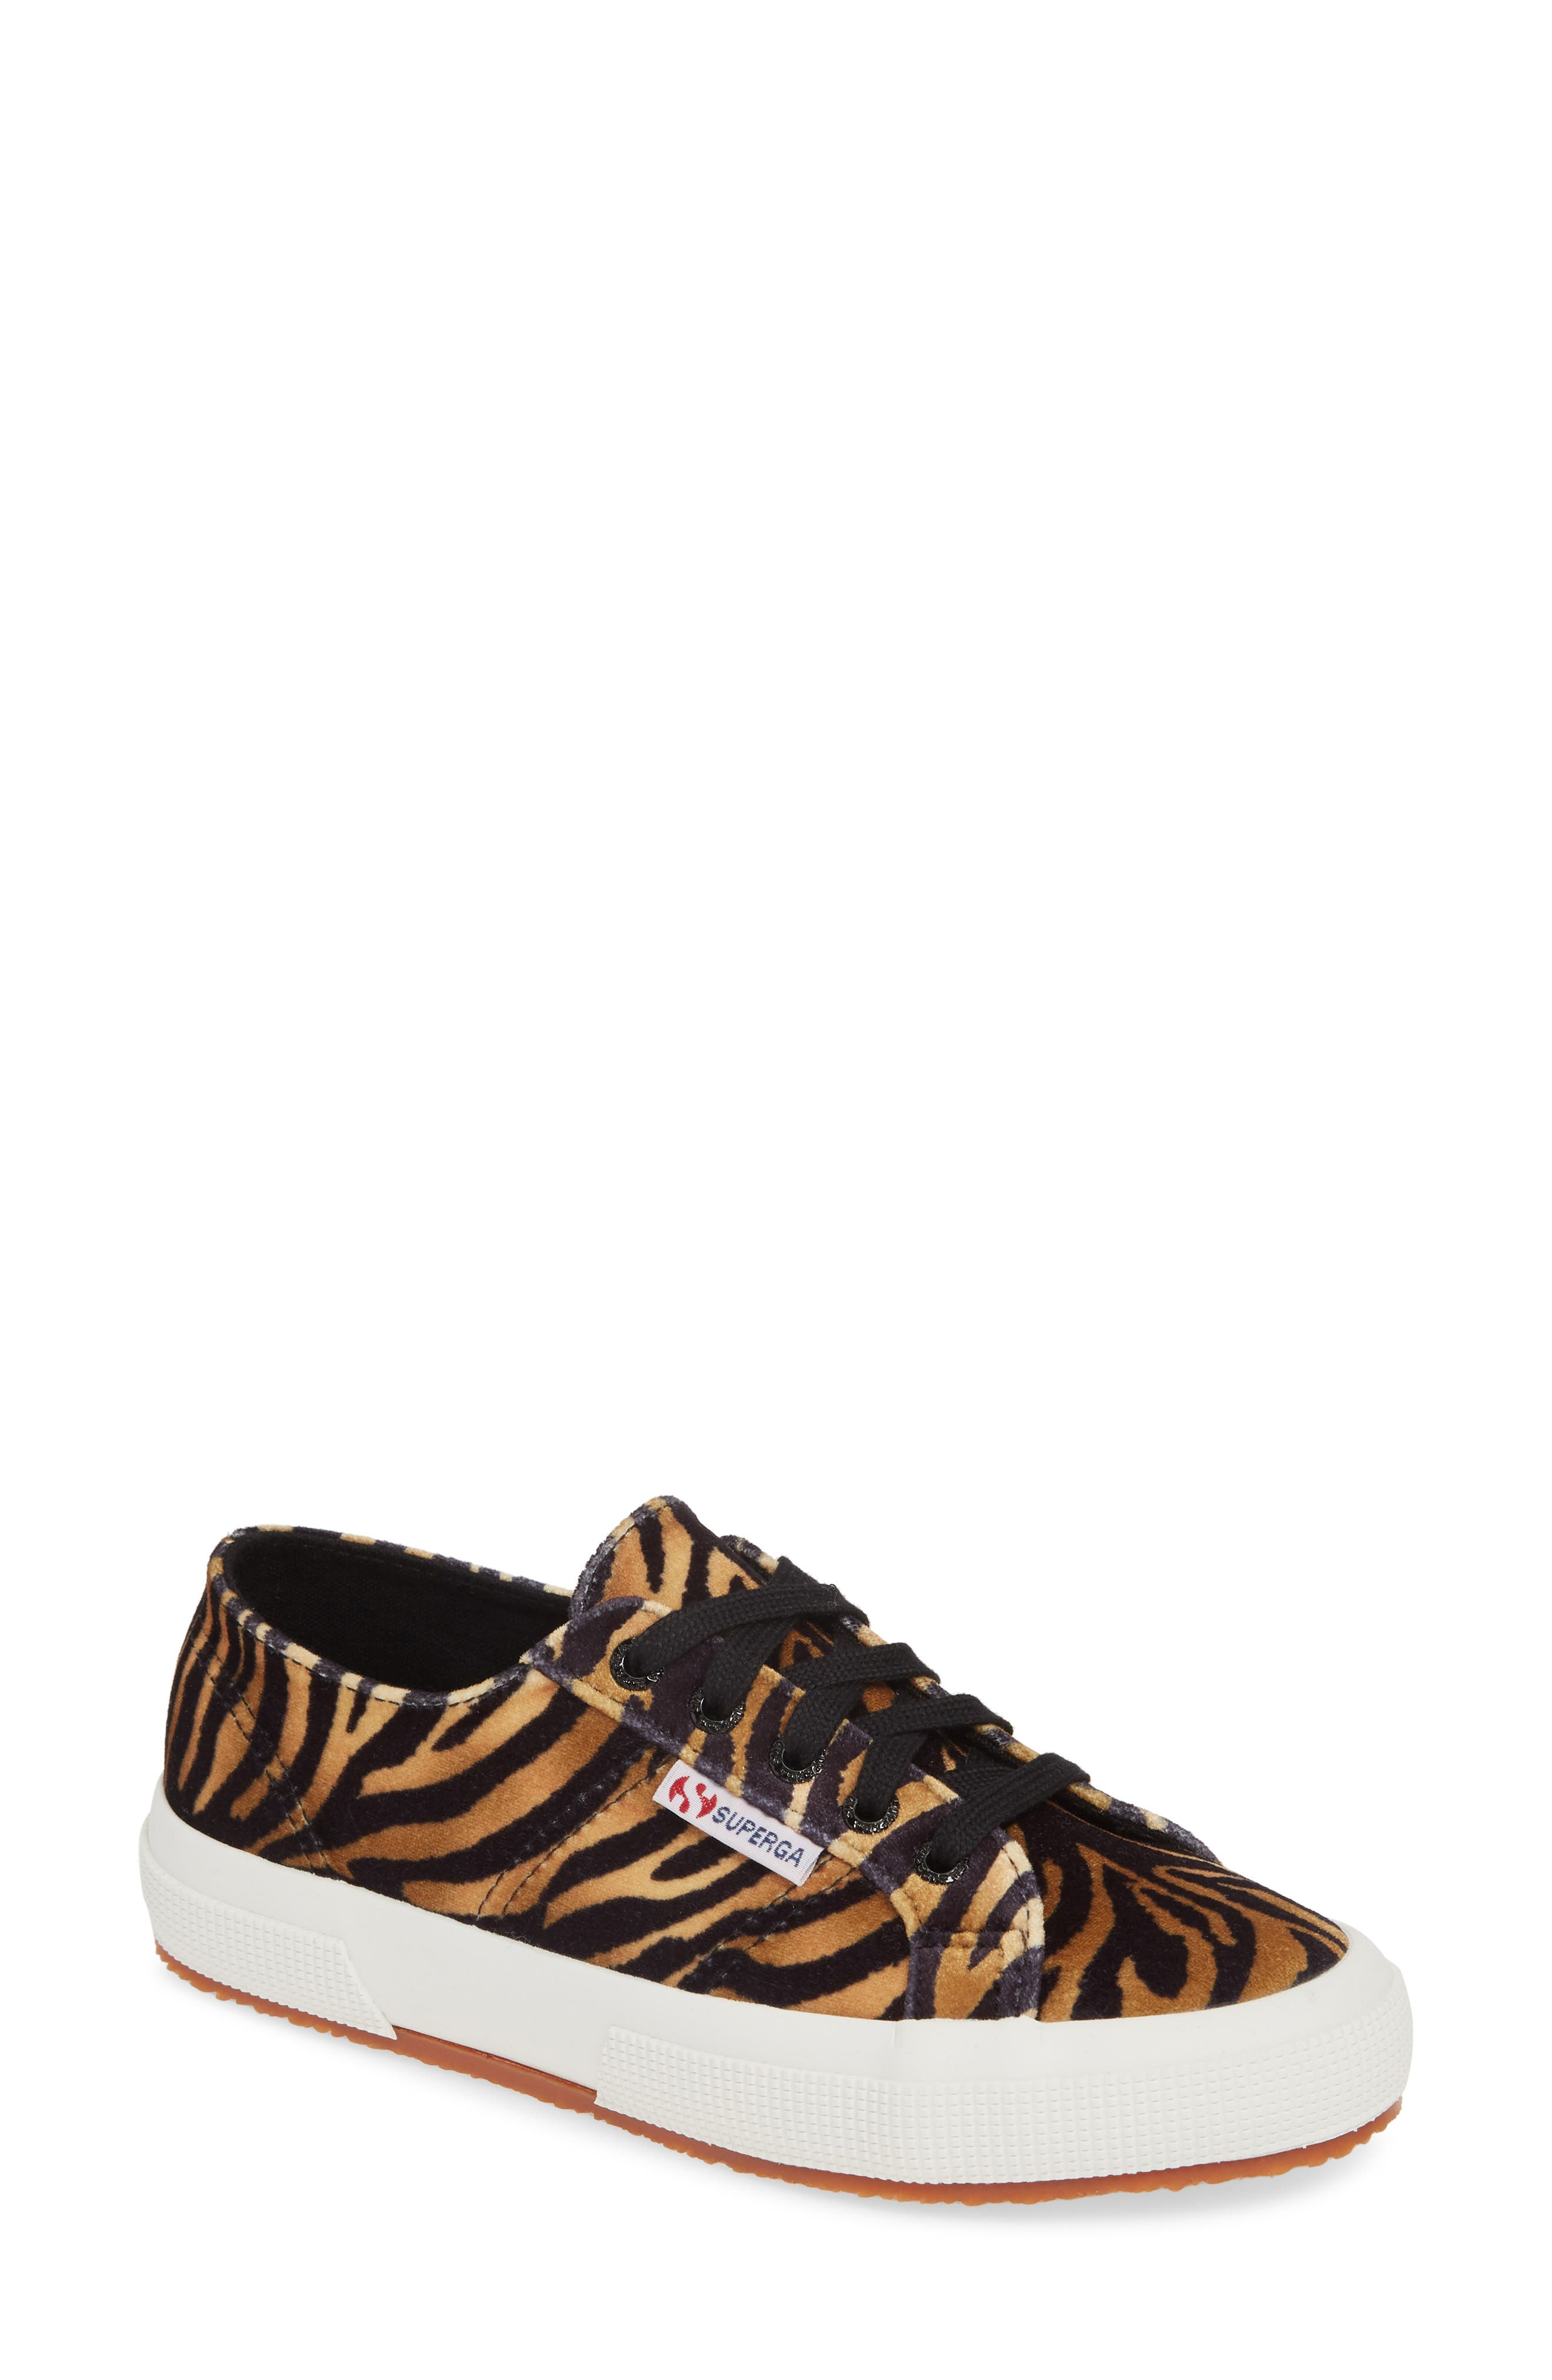 24482704d690 Superga Shoes   Sneakers